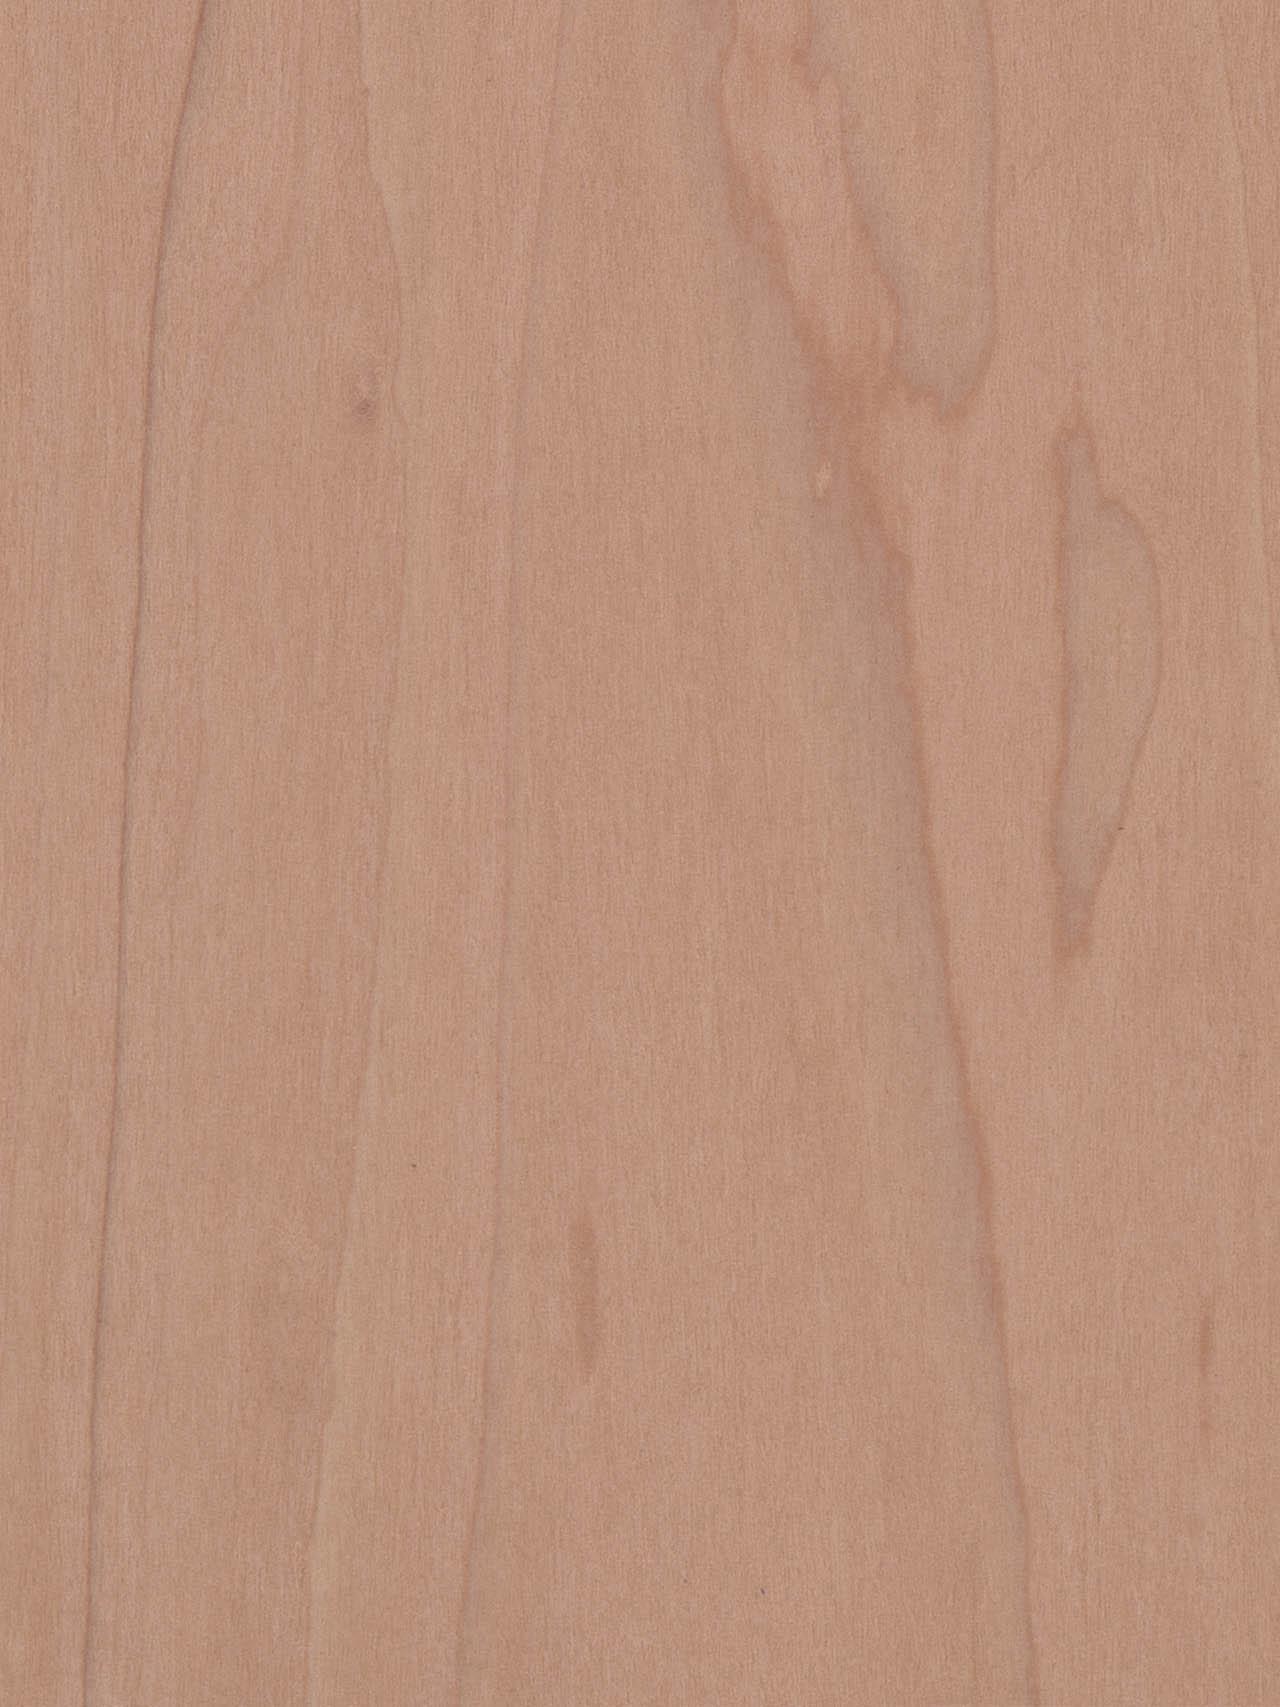 Chapa madera Tulipié Amaranto RAF108